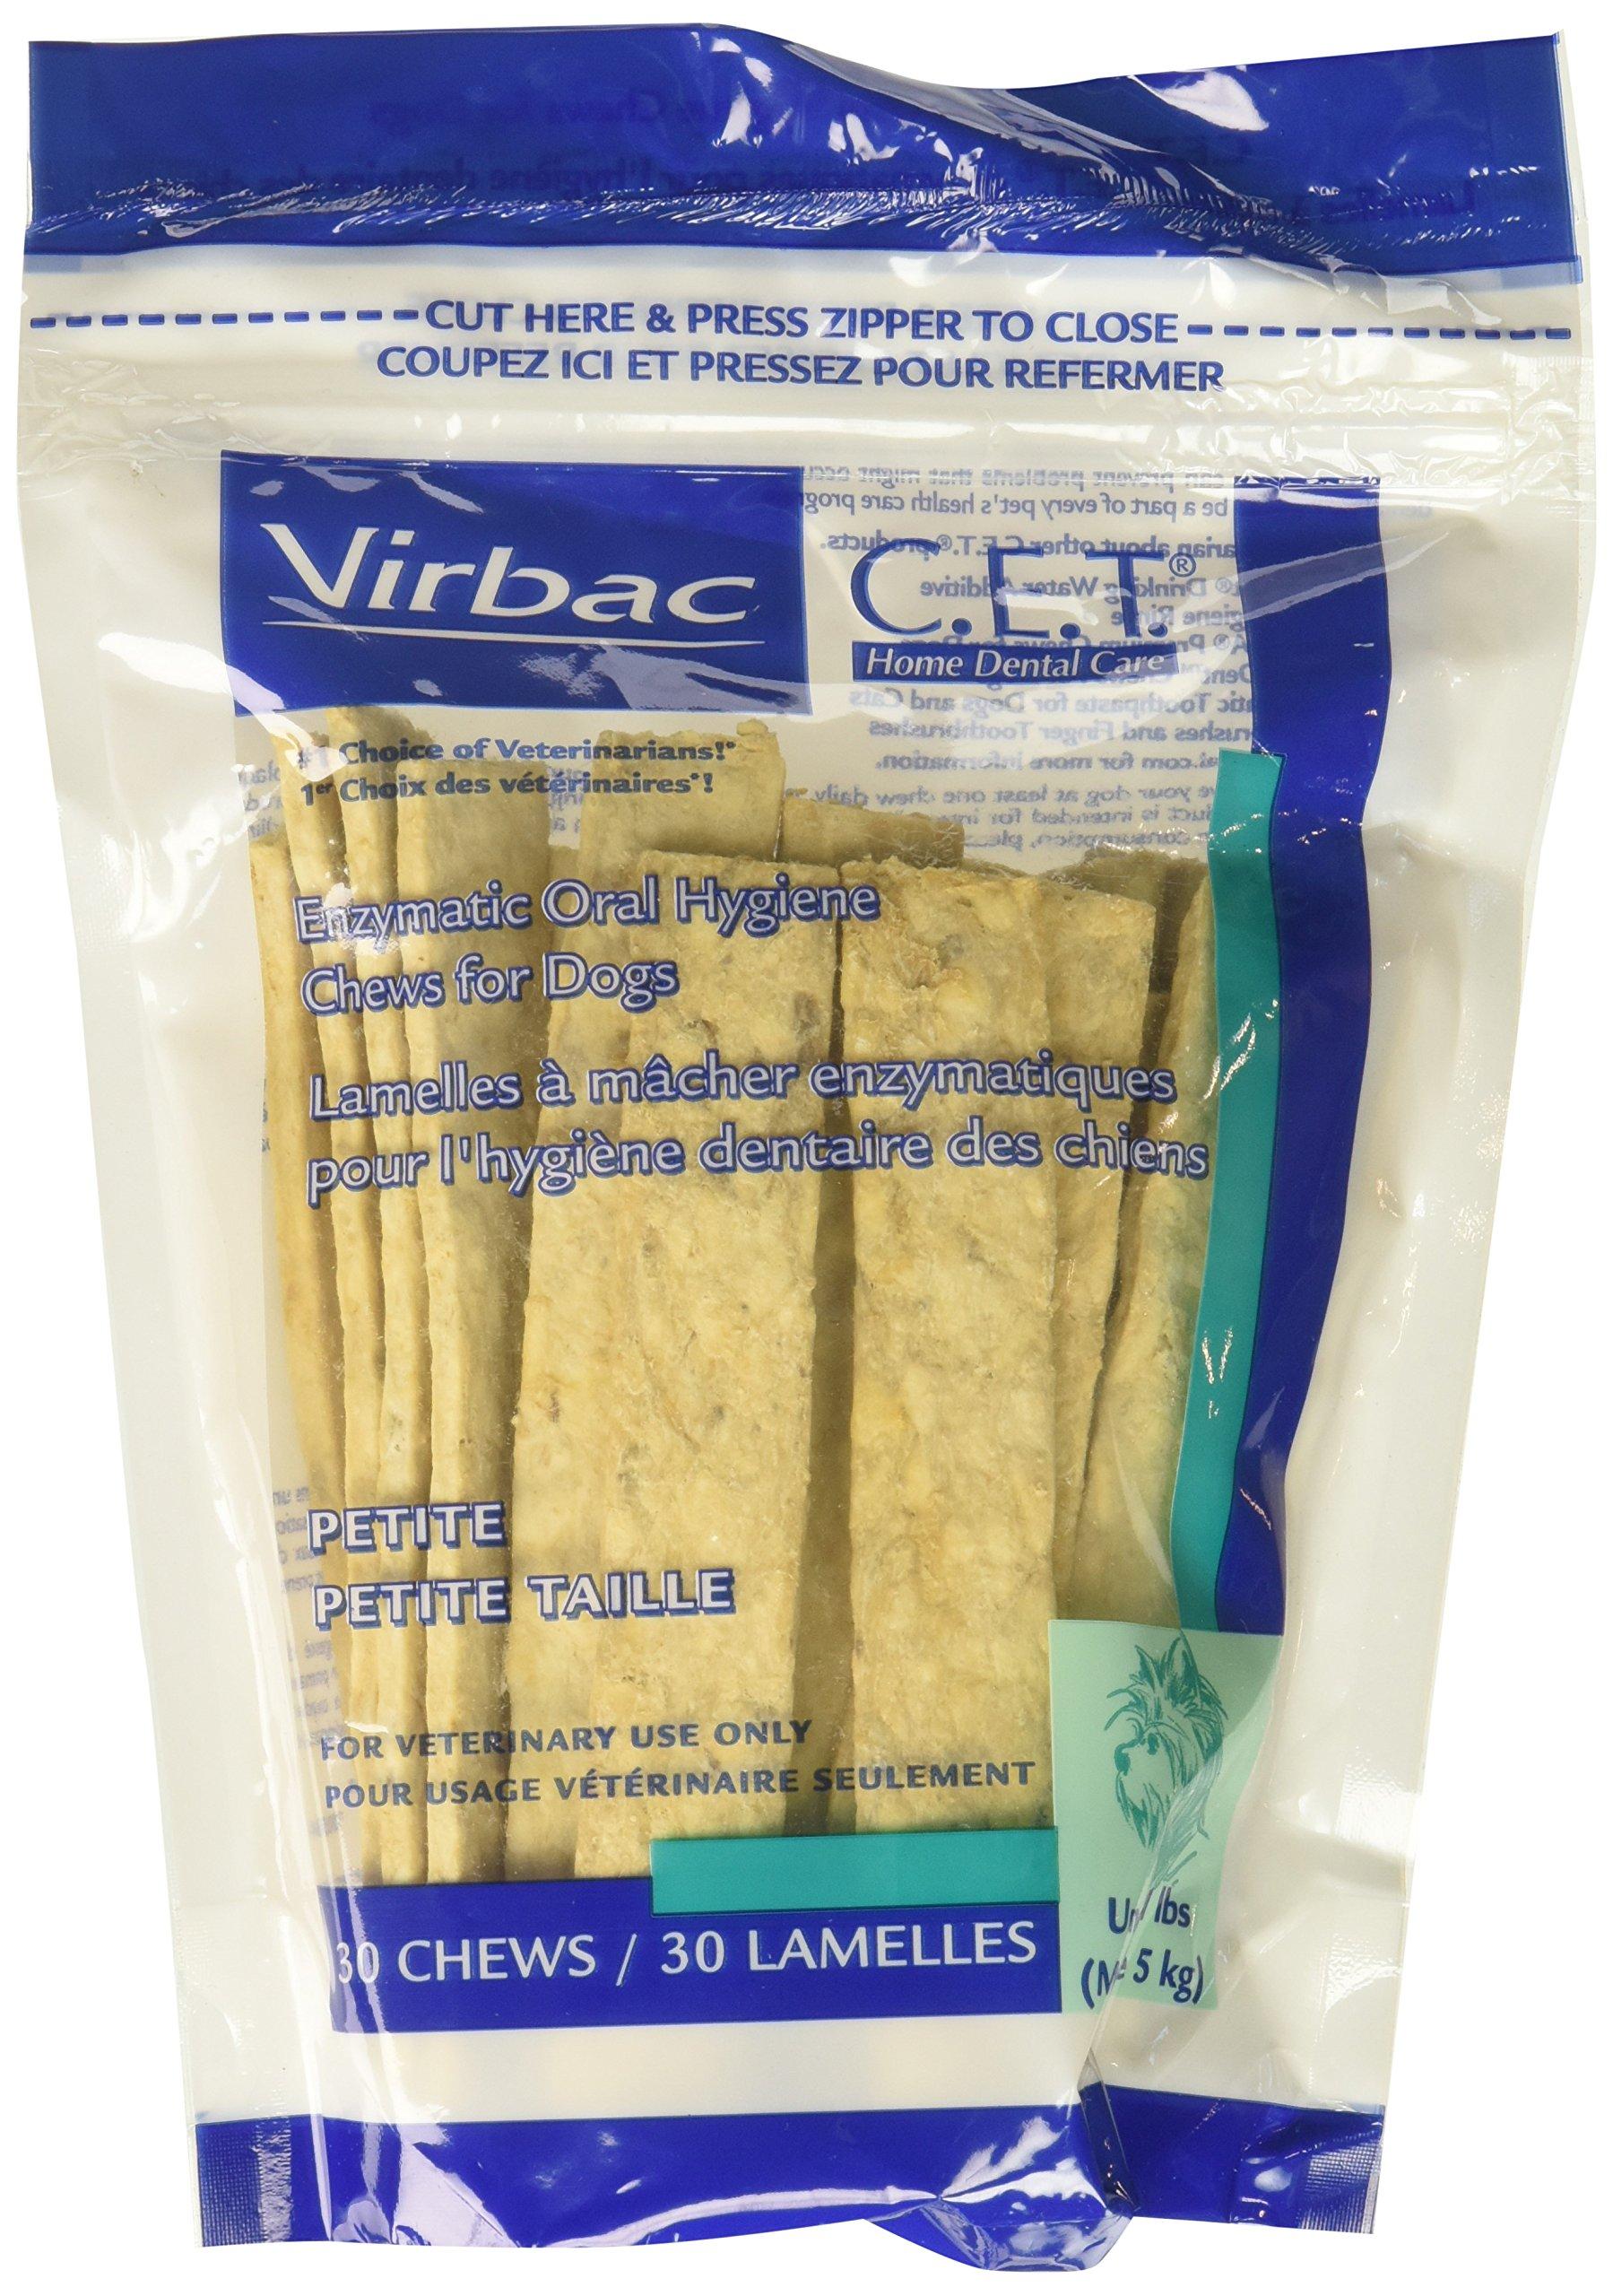 C.E.T. Enzymatic Oral Hygiene Chews, Petite Dogs, 3 Pack 90 Chews by Virbac